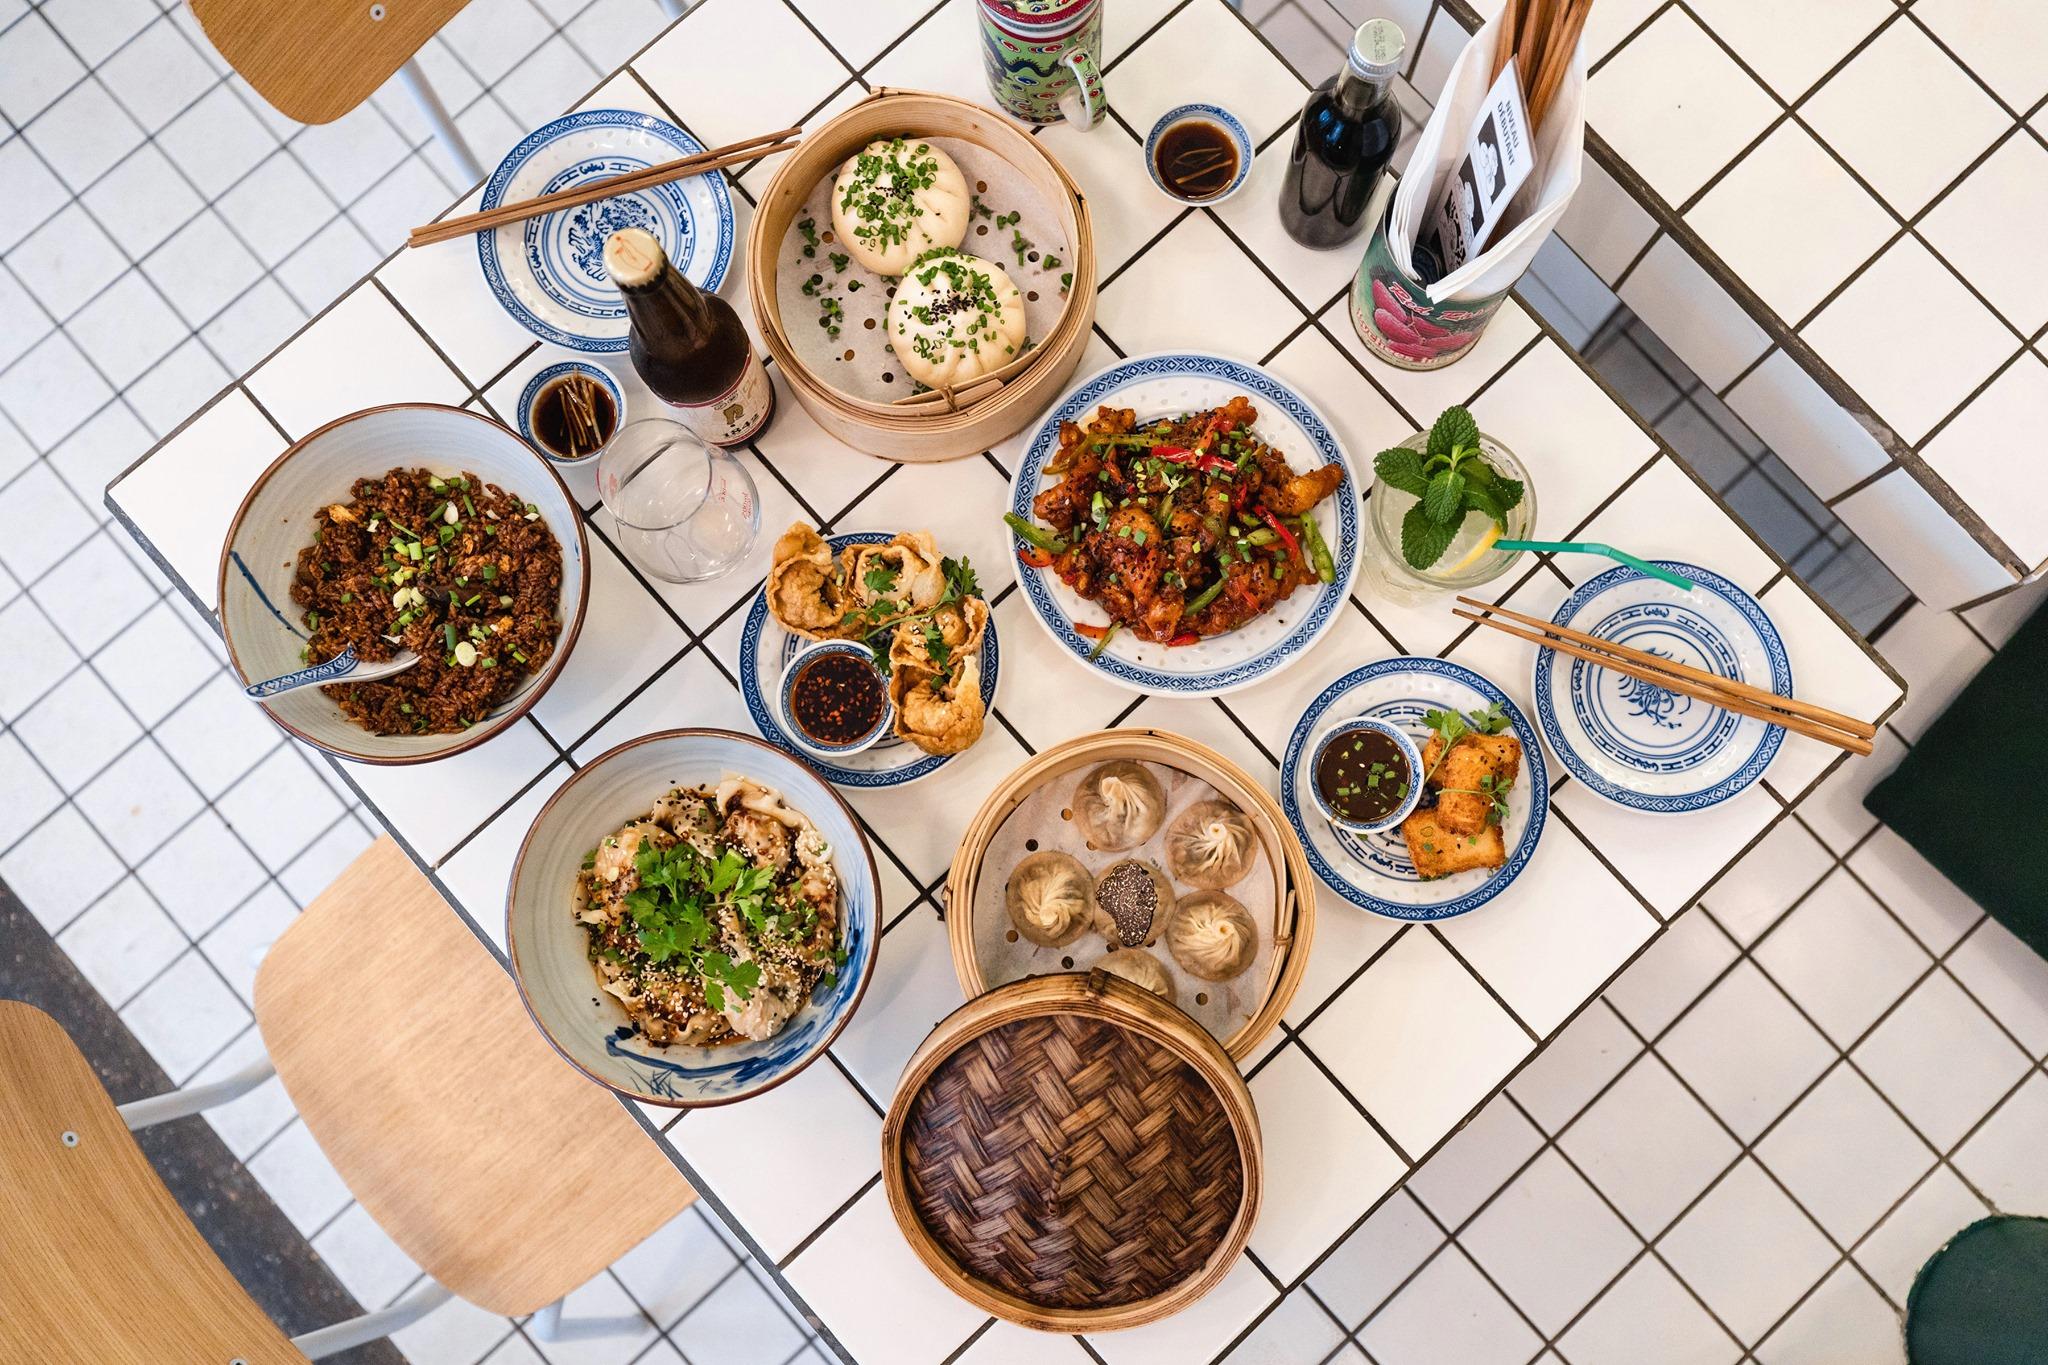 gros bao paris restaurant chinois canal saint martin gros bao reservation bao paris